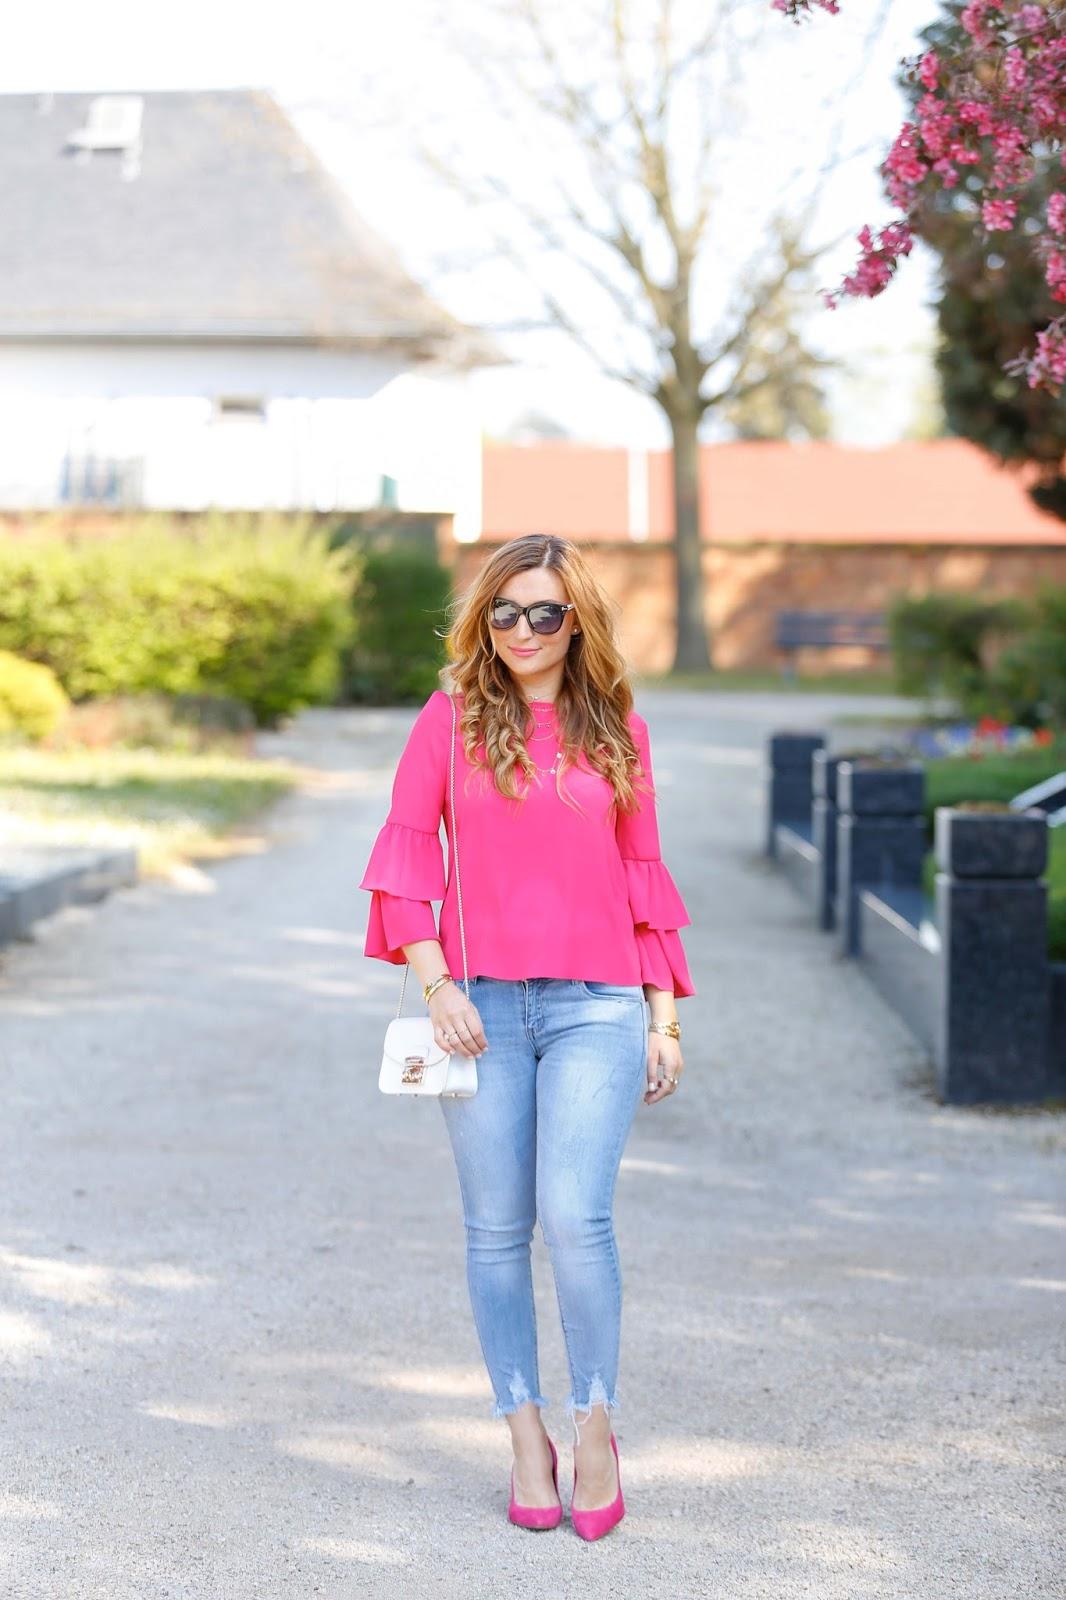 Pinke-bluse-verwaschene-Jeans-pinke-high-heels